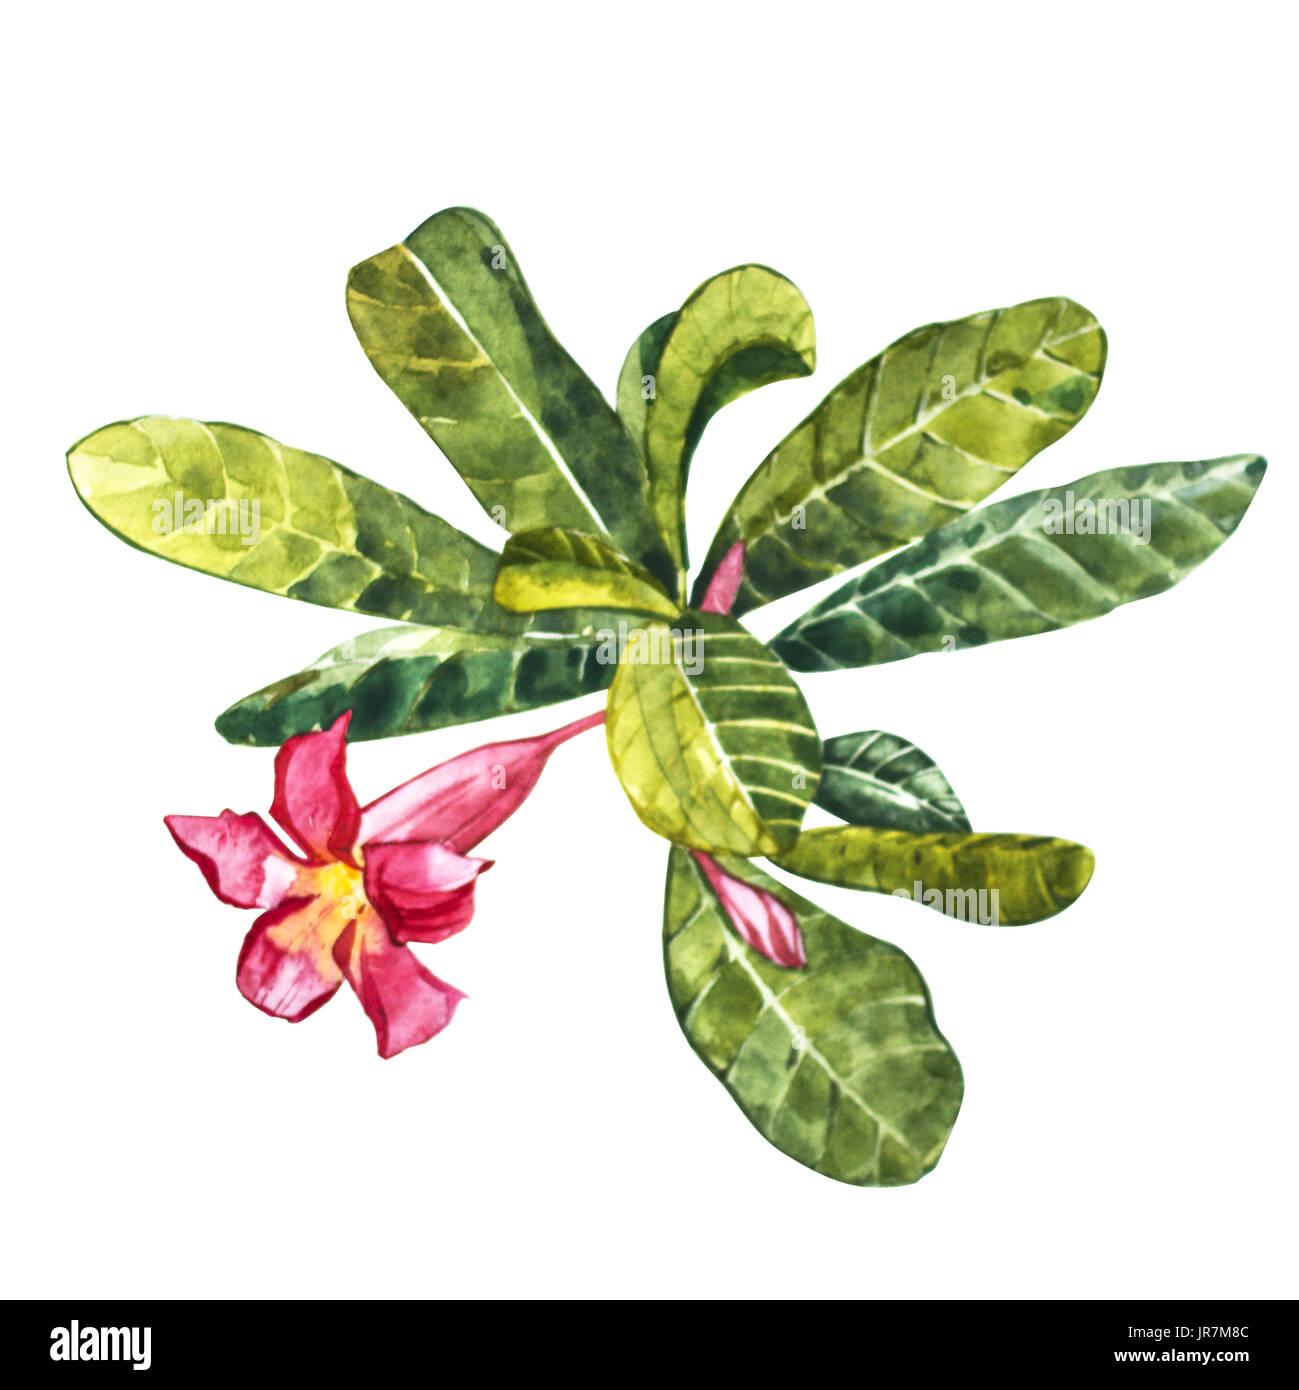 Flores Tropicales Aislado Sobre Fondo Blanco Objeto De Dibujo De